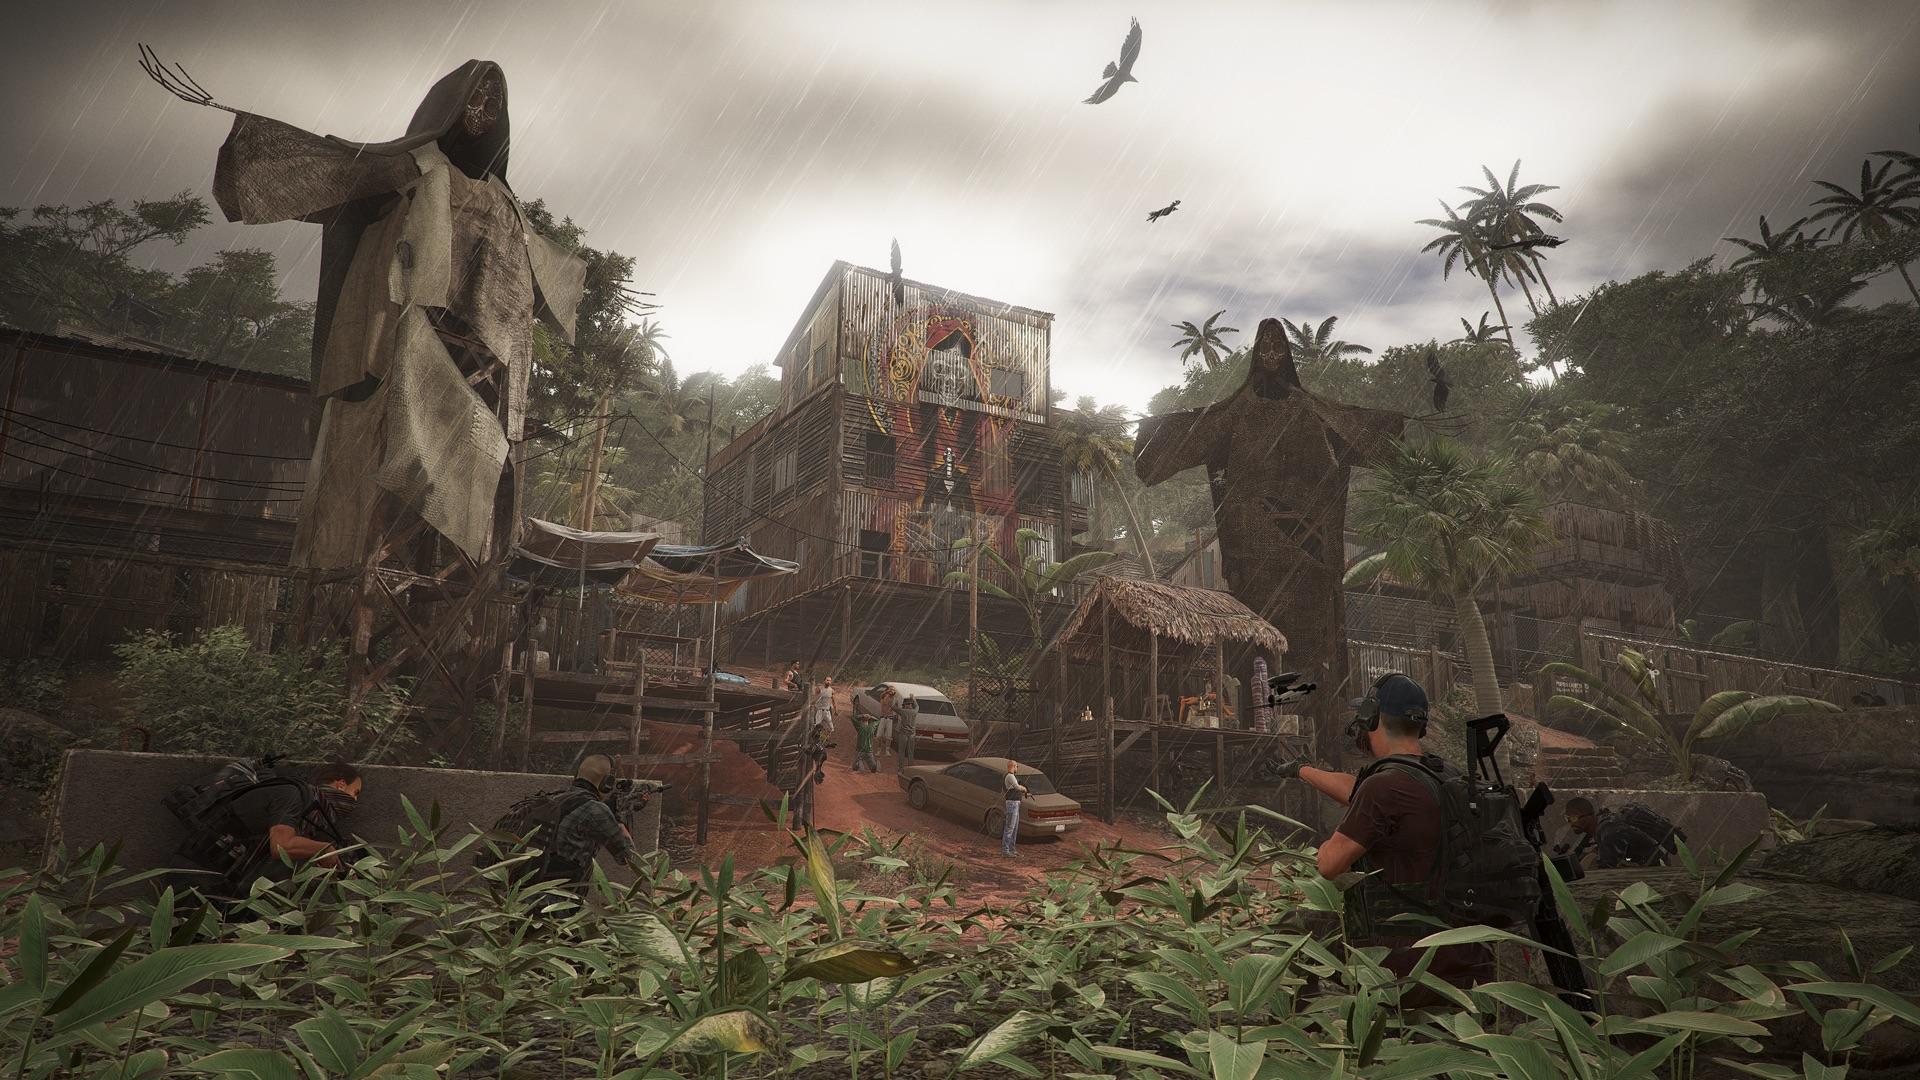 Tom Clancy's Ghost Recon Wildlands, Courtesy of Ubisoft